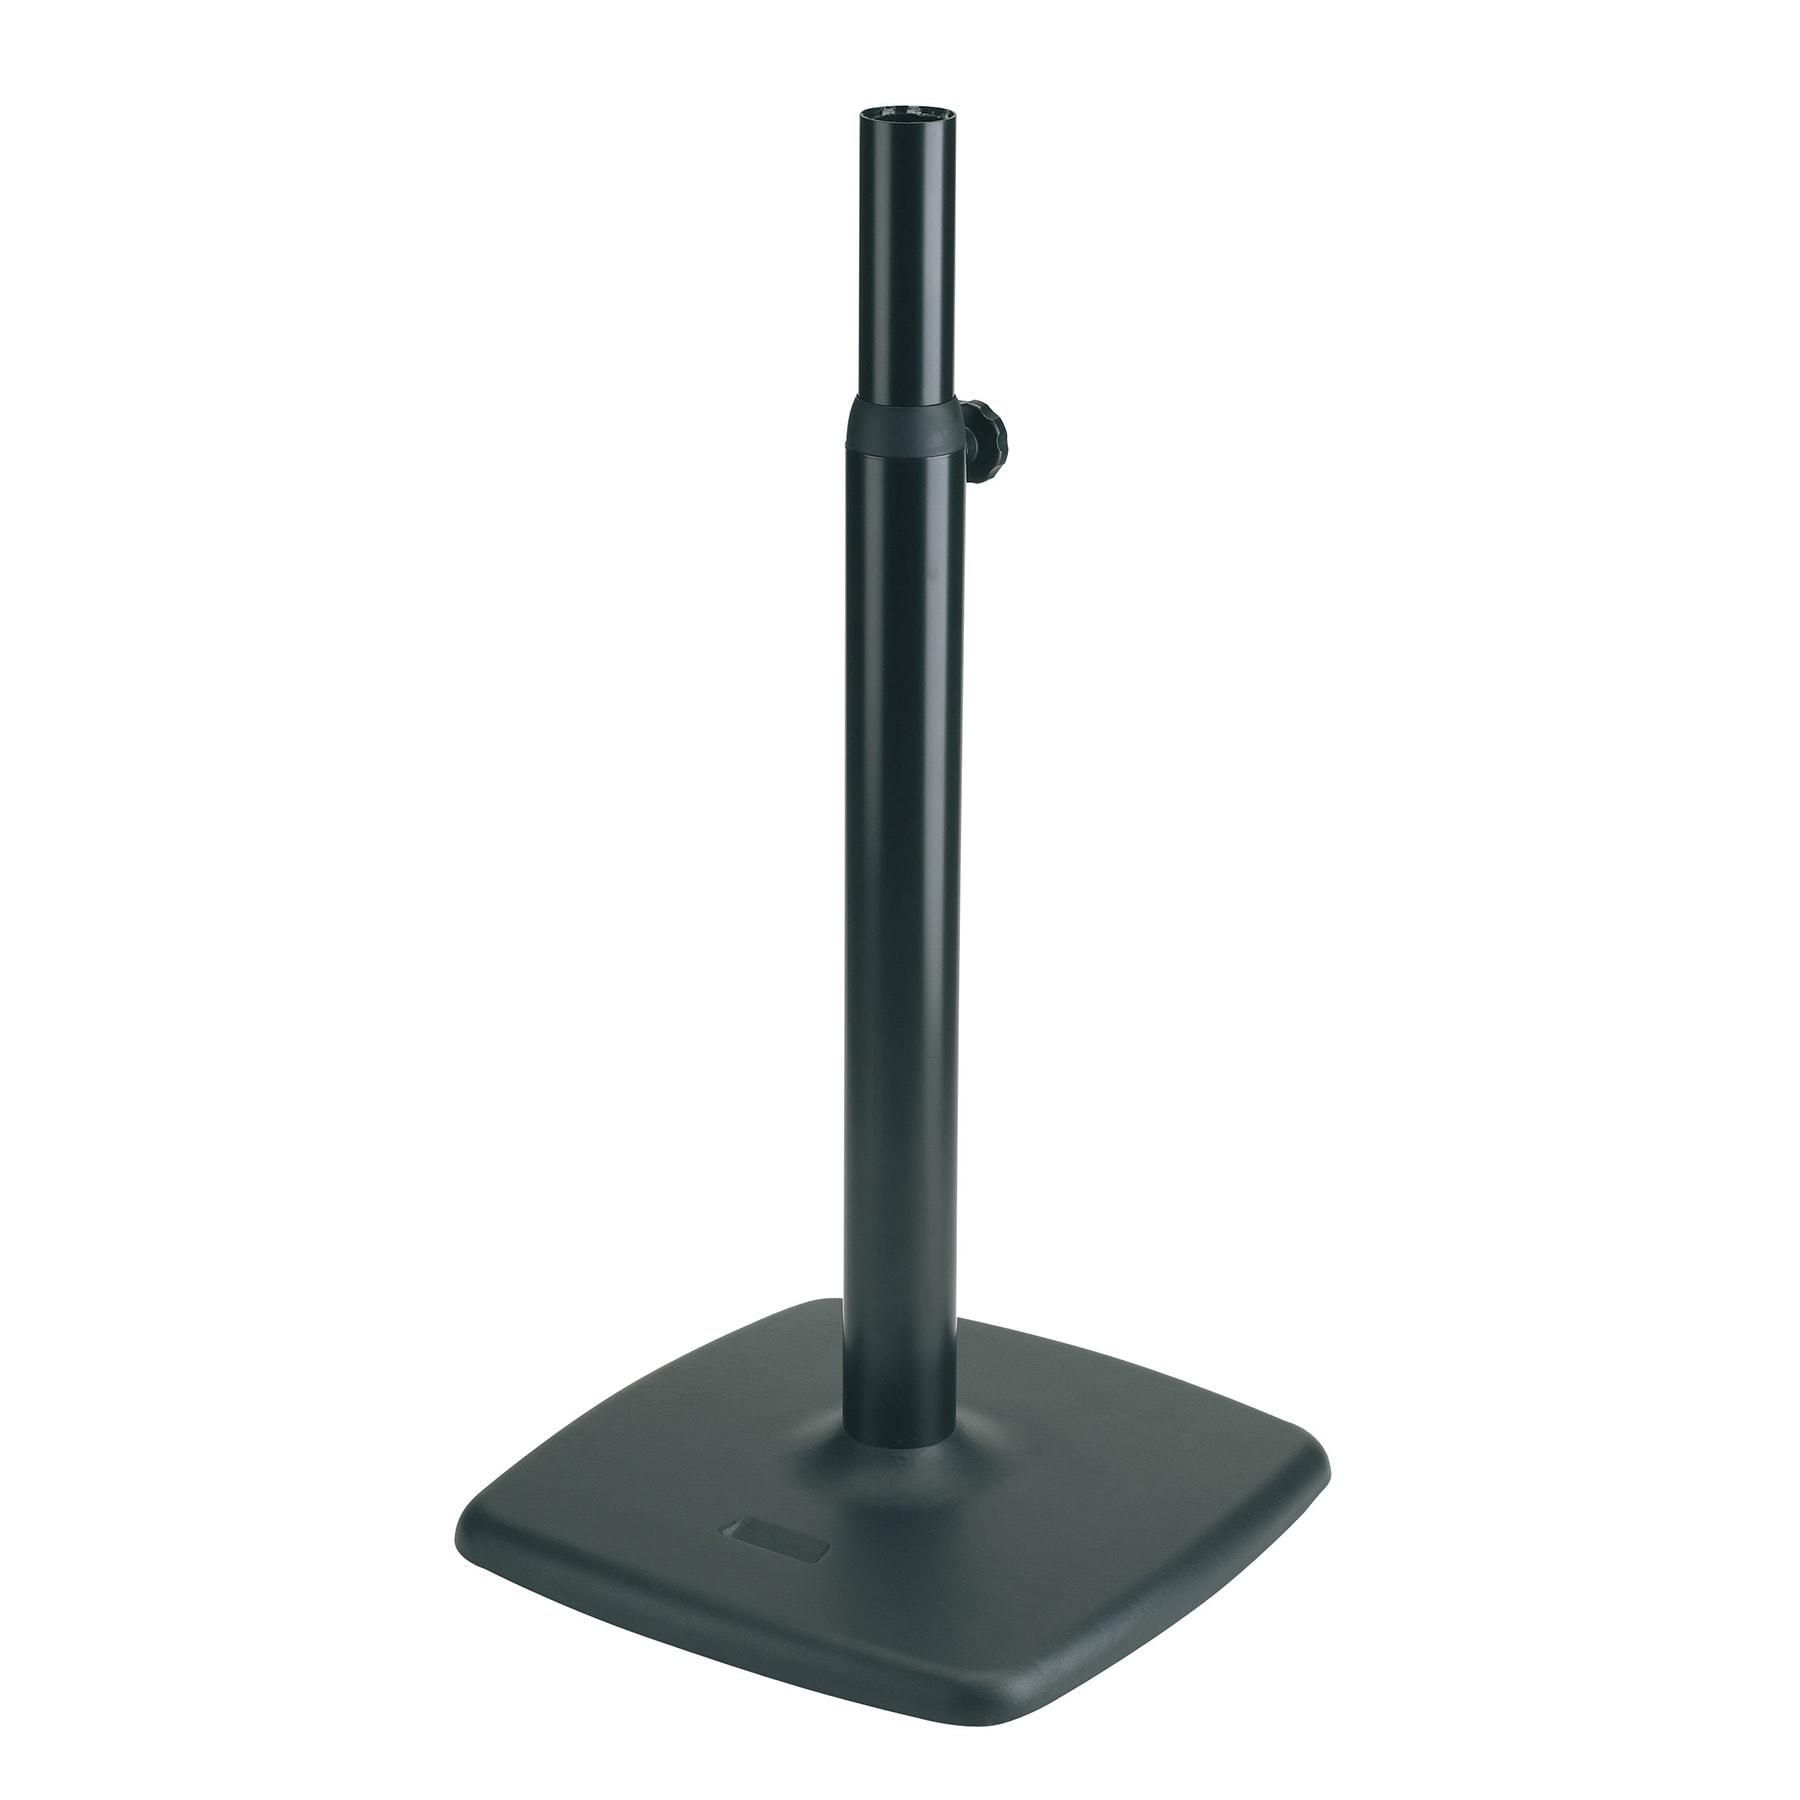 KM26795 - Design monitor stand